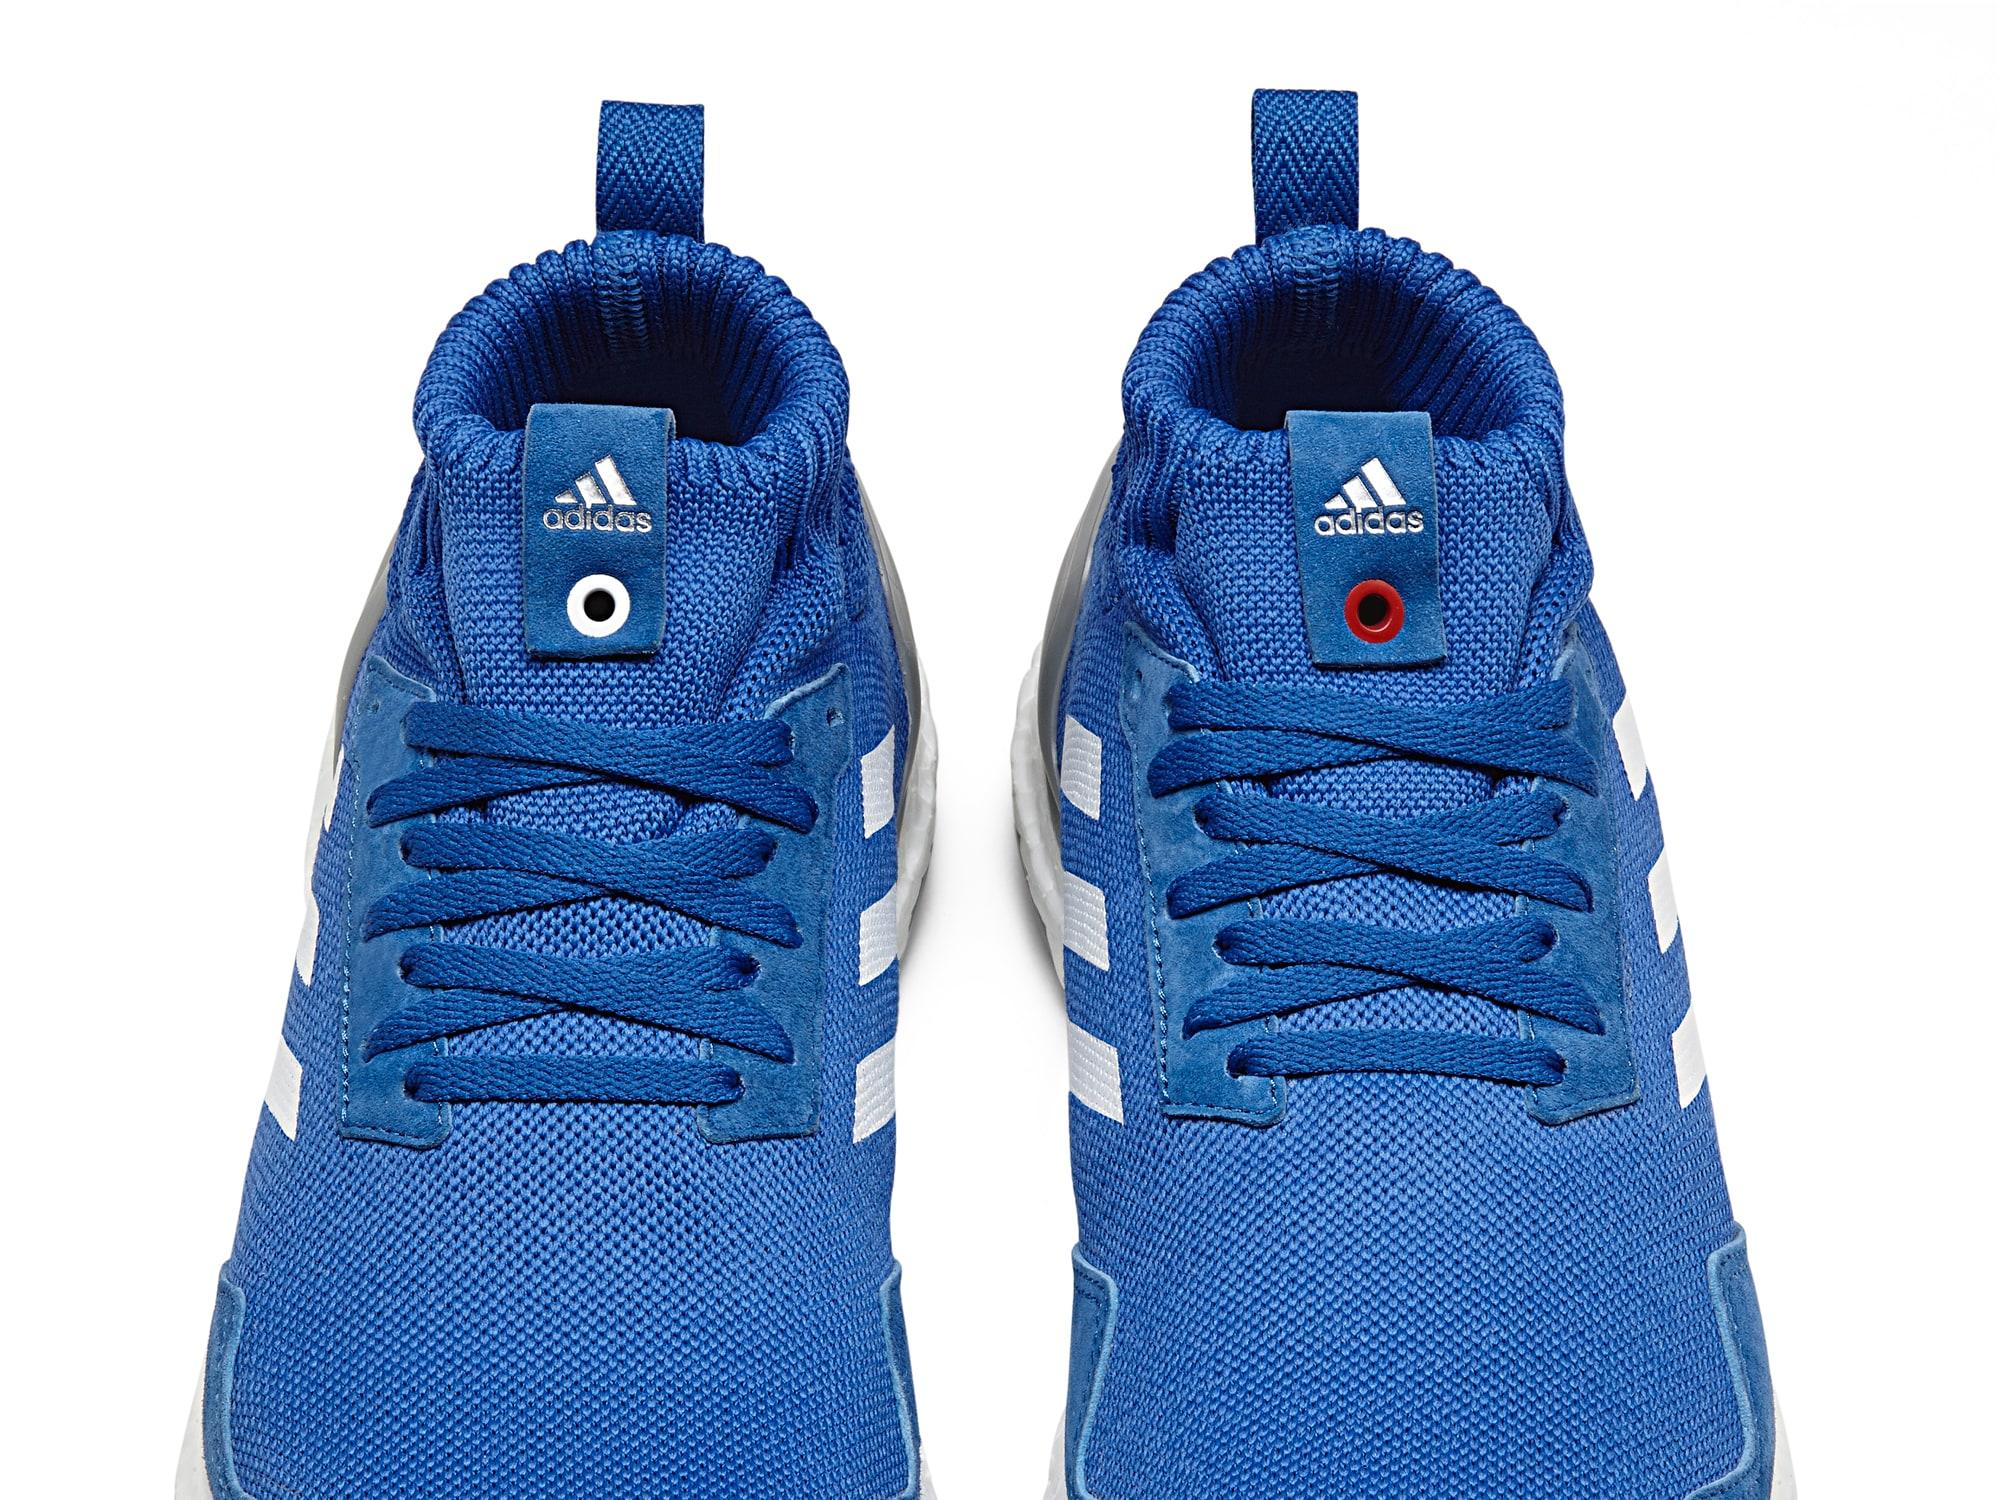 Adidas Ultra Boost Mid Run Thru Time Size 11